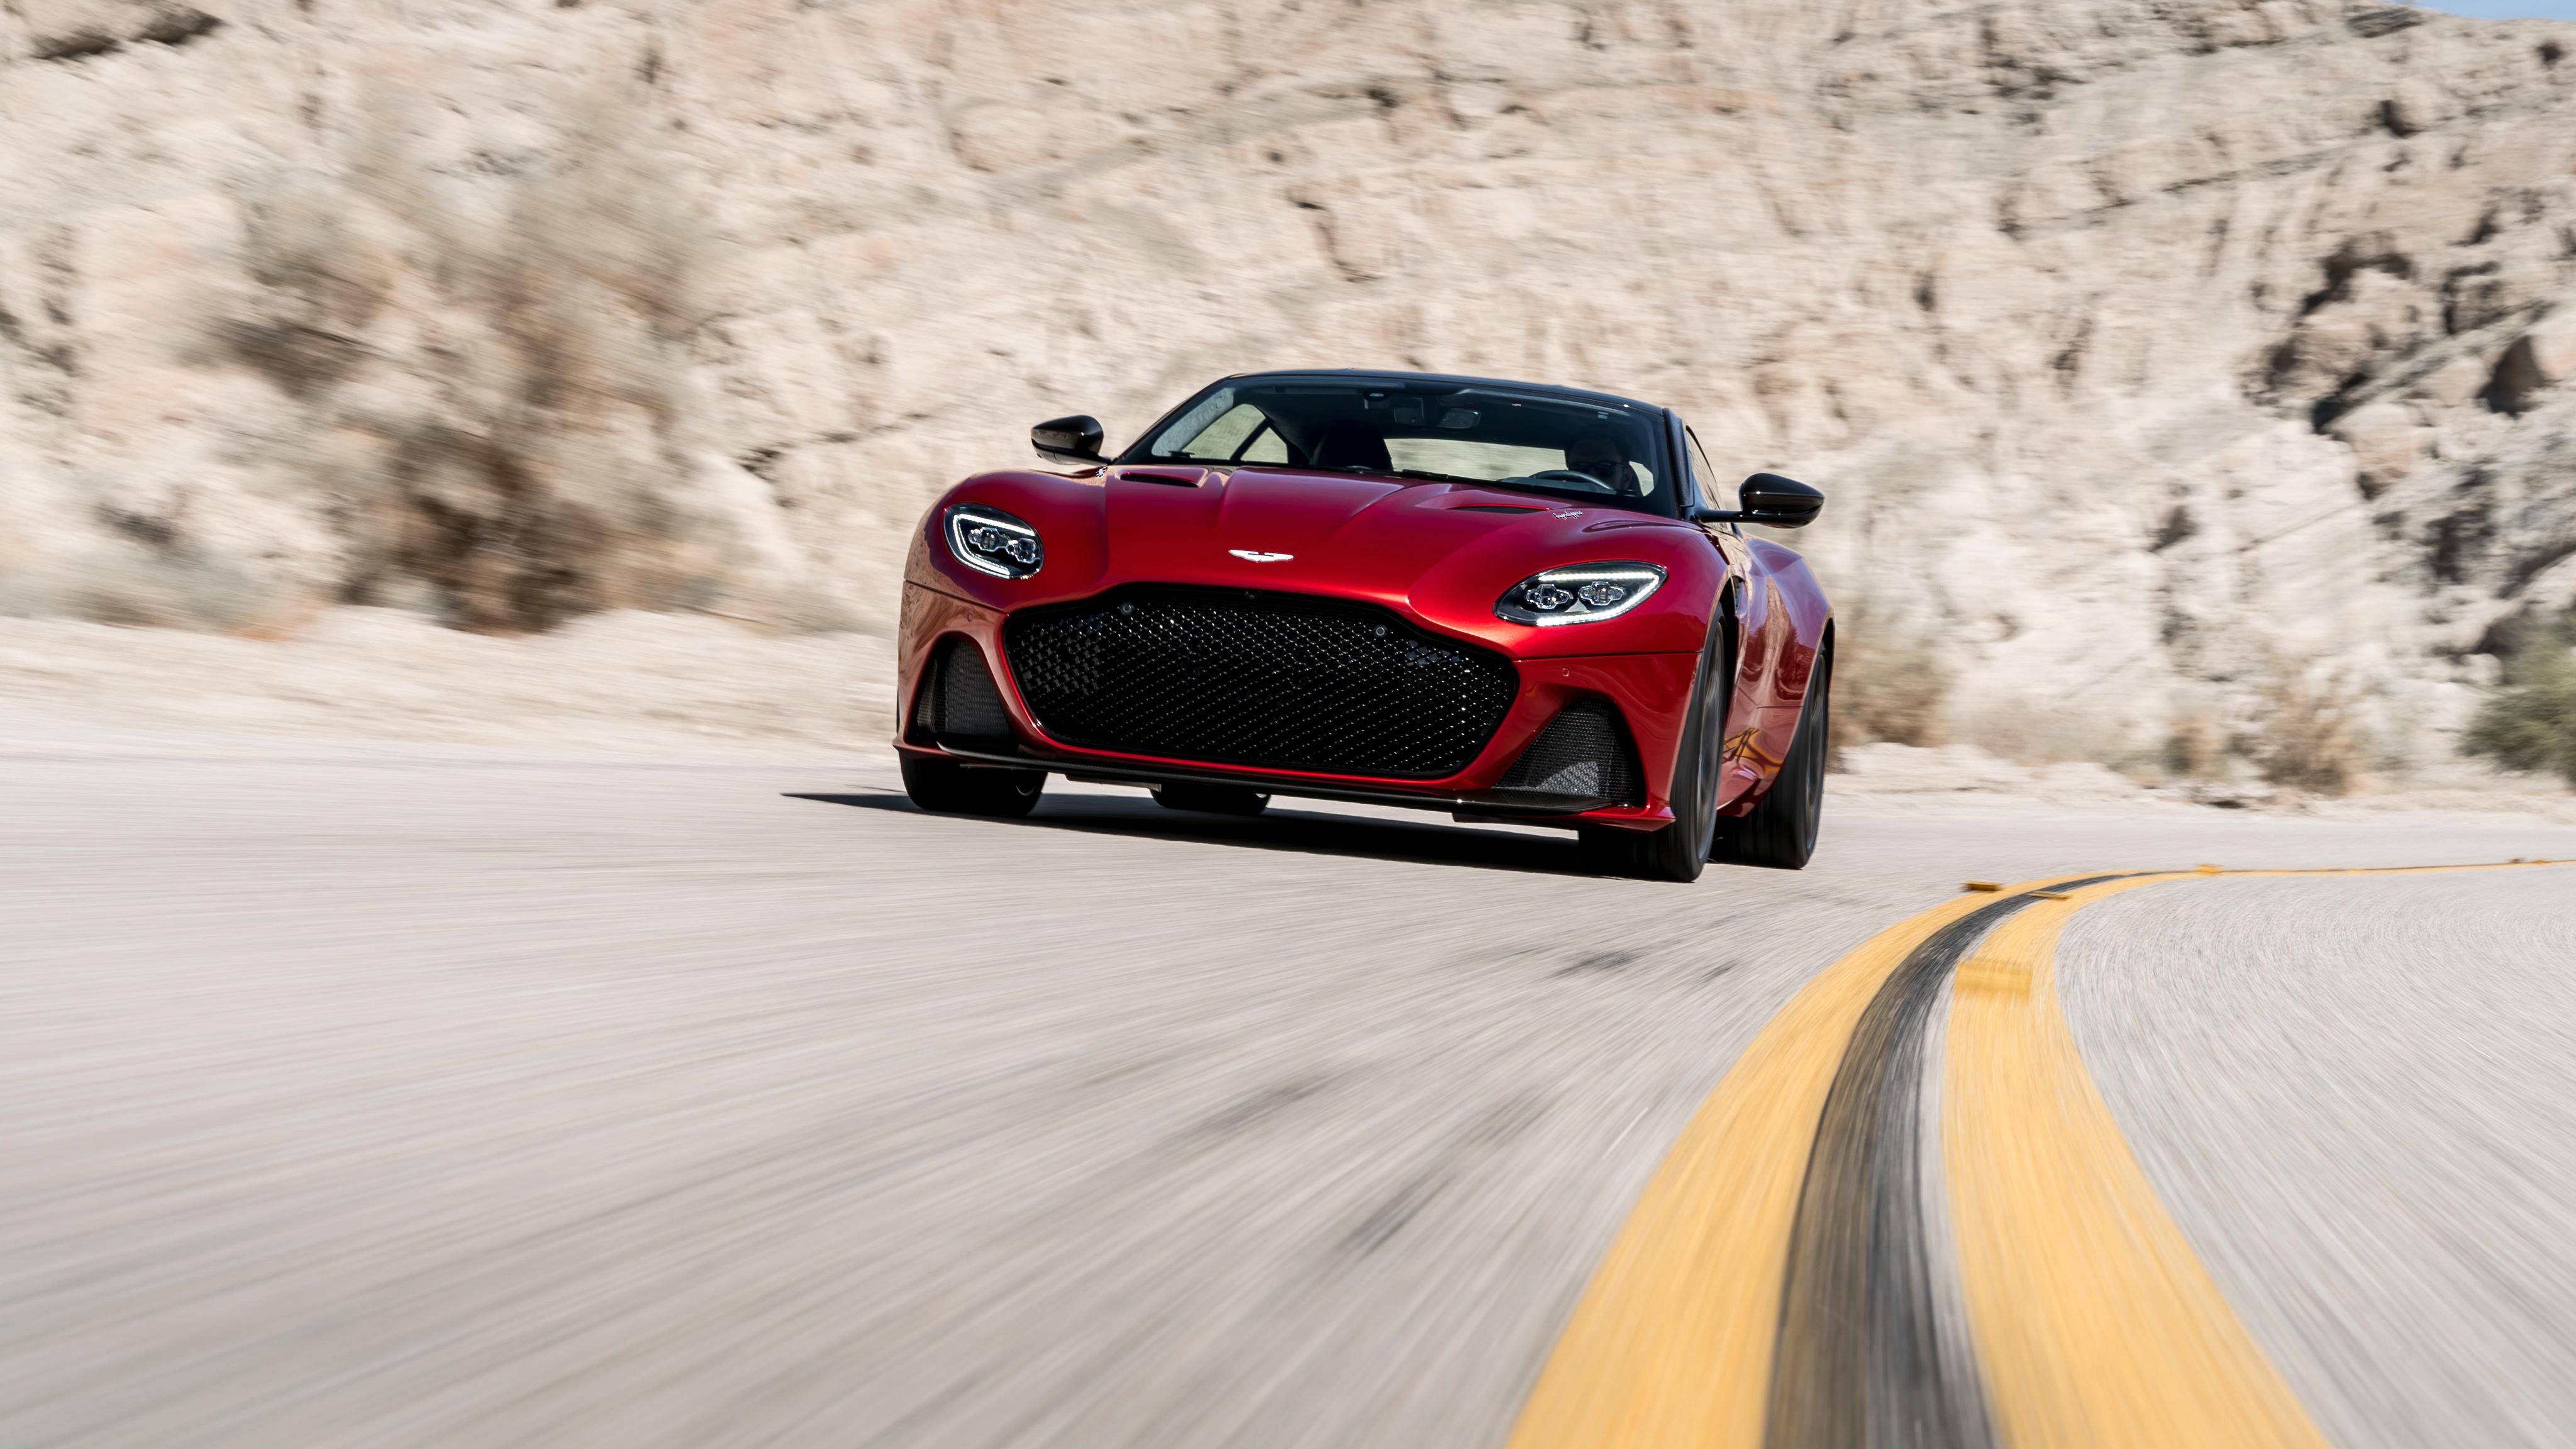 Aston Martin Dbs Superleggera 2018 4k 6 Wallpaper Hd Car